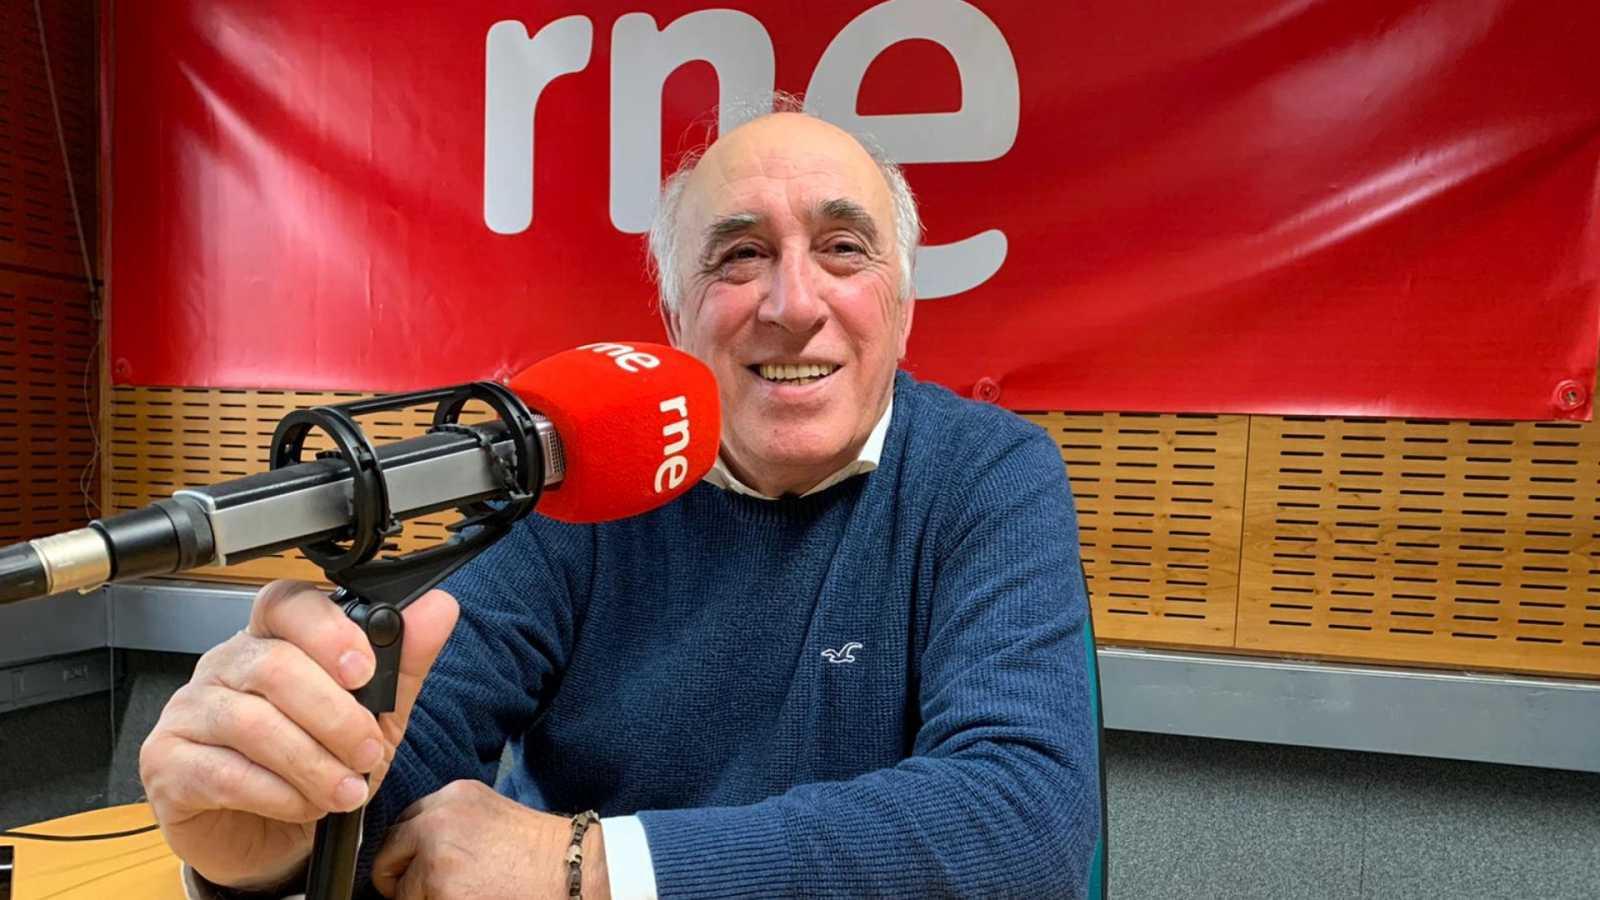 Mitos del deporte - Juan Manuel Asensi - 03/02/20 - escuchar ahora